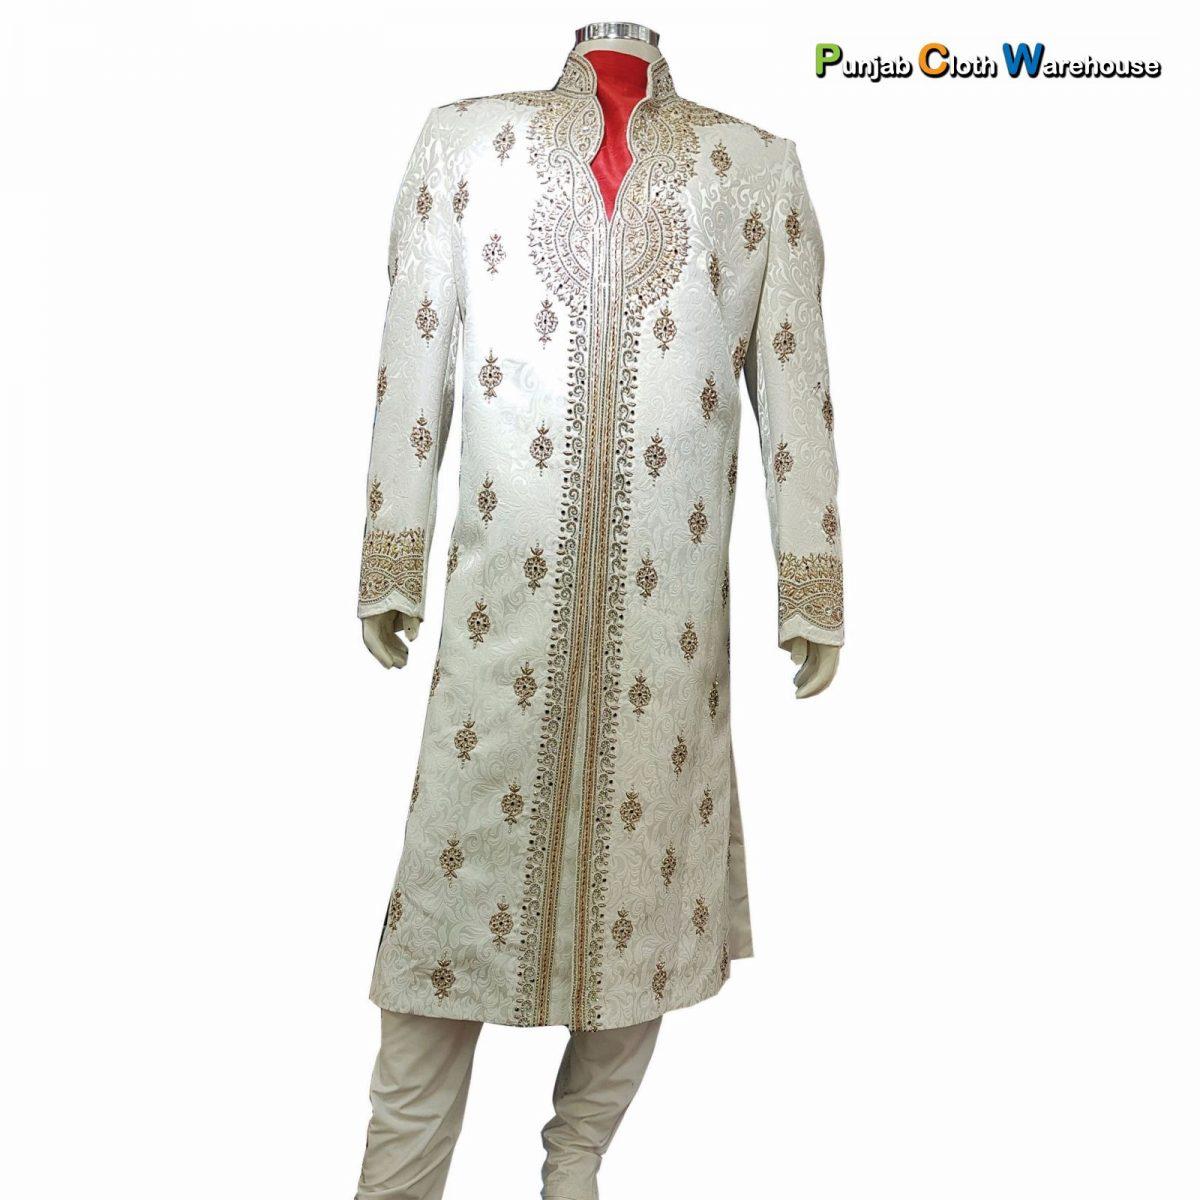 Designer Party Wear Suits, Sarees, Lehengas & Sherwanis (41)